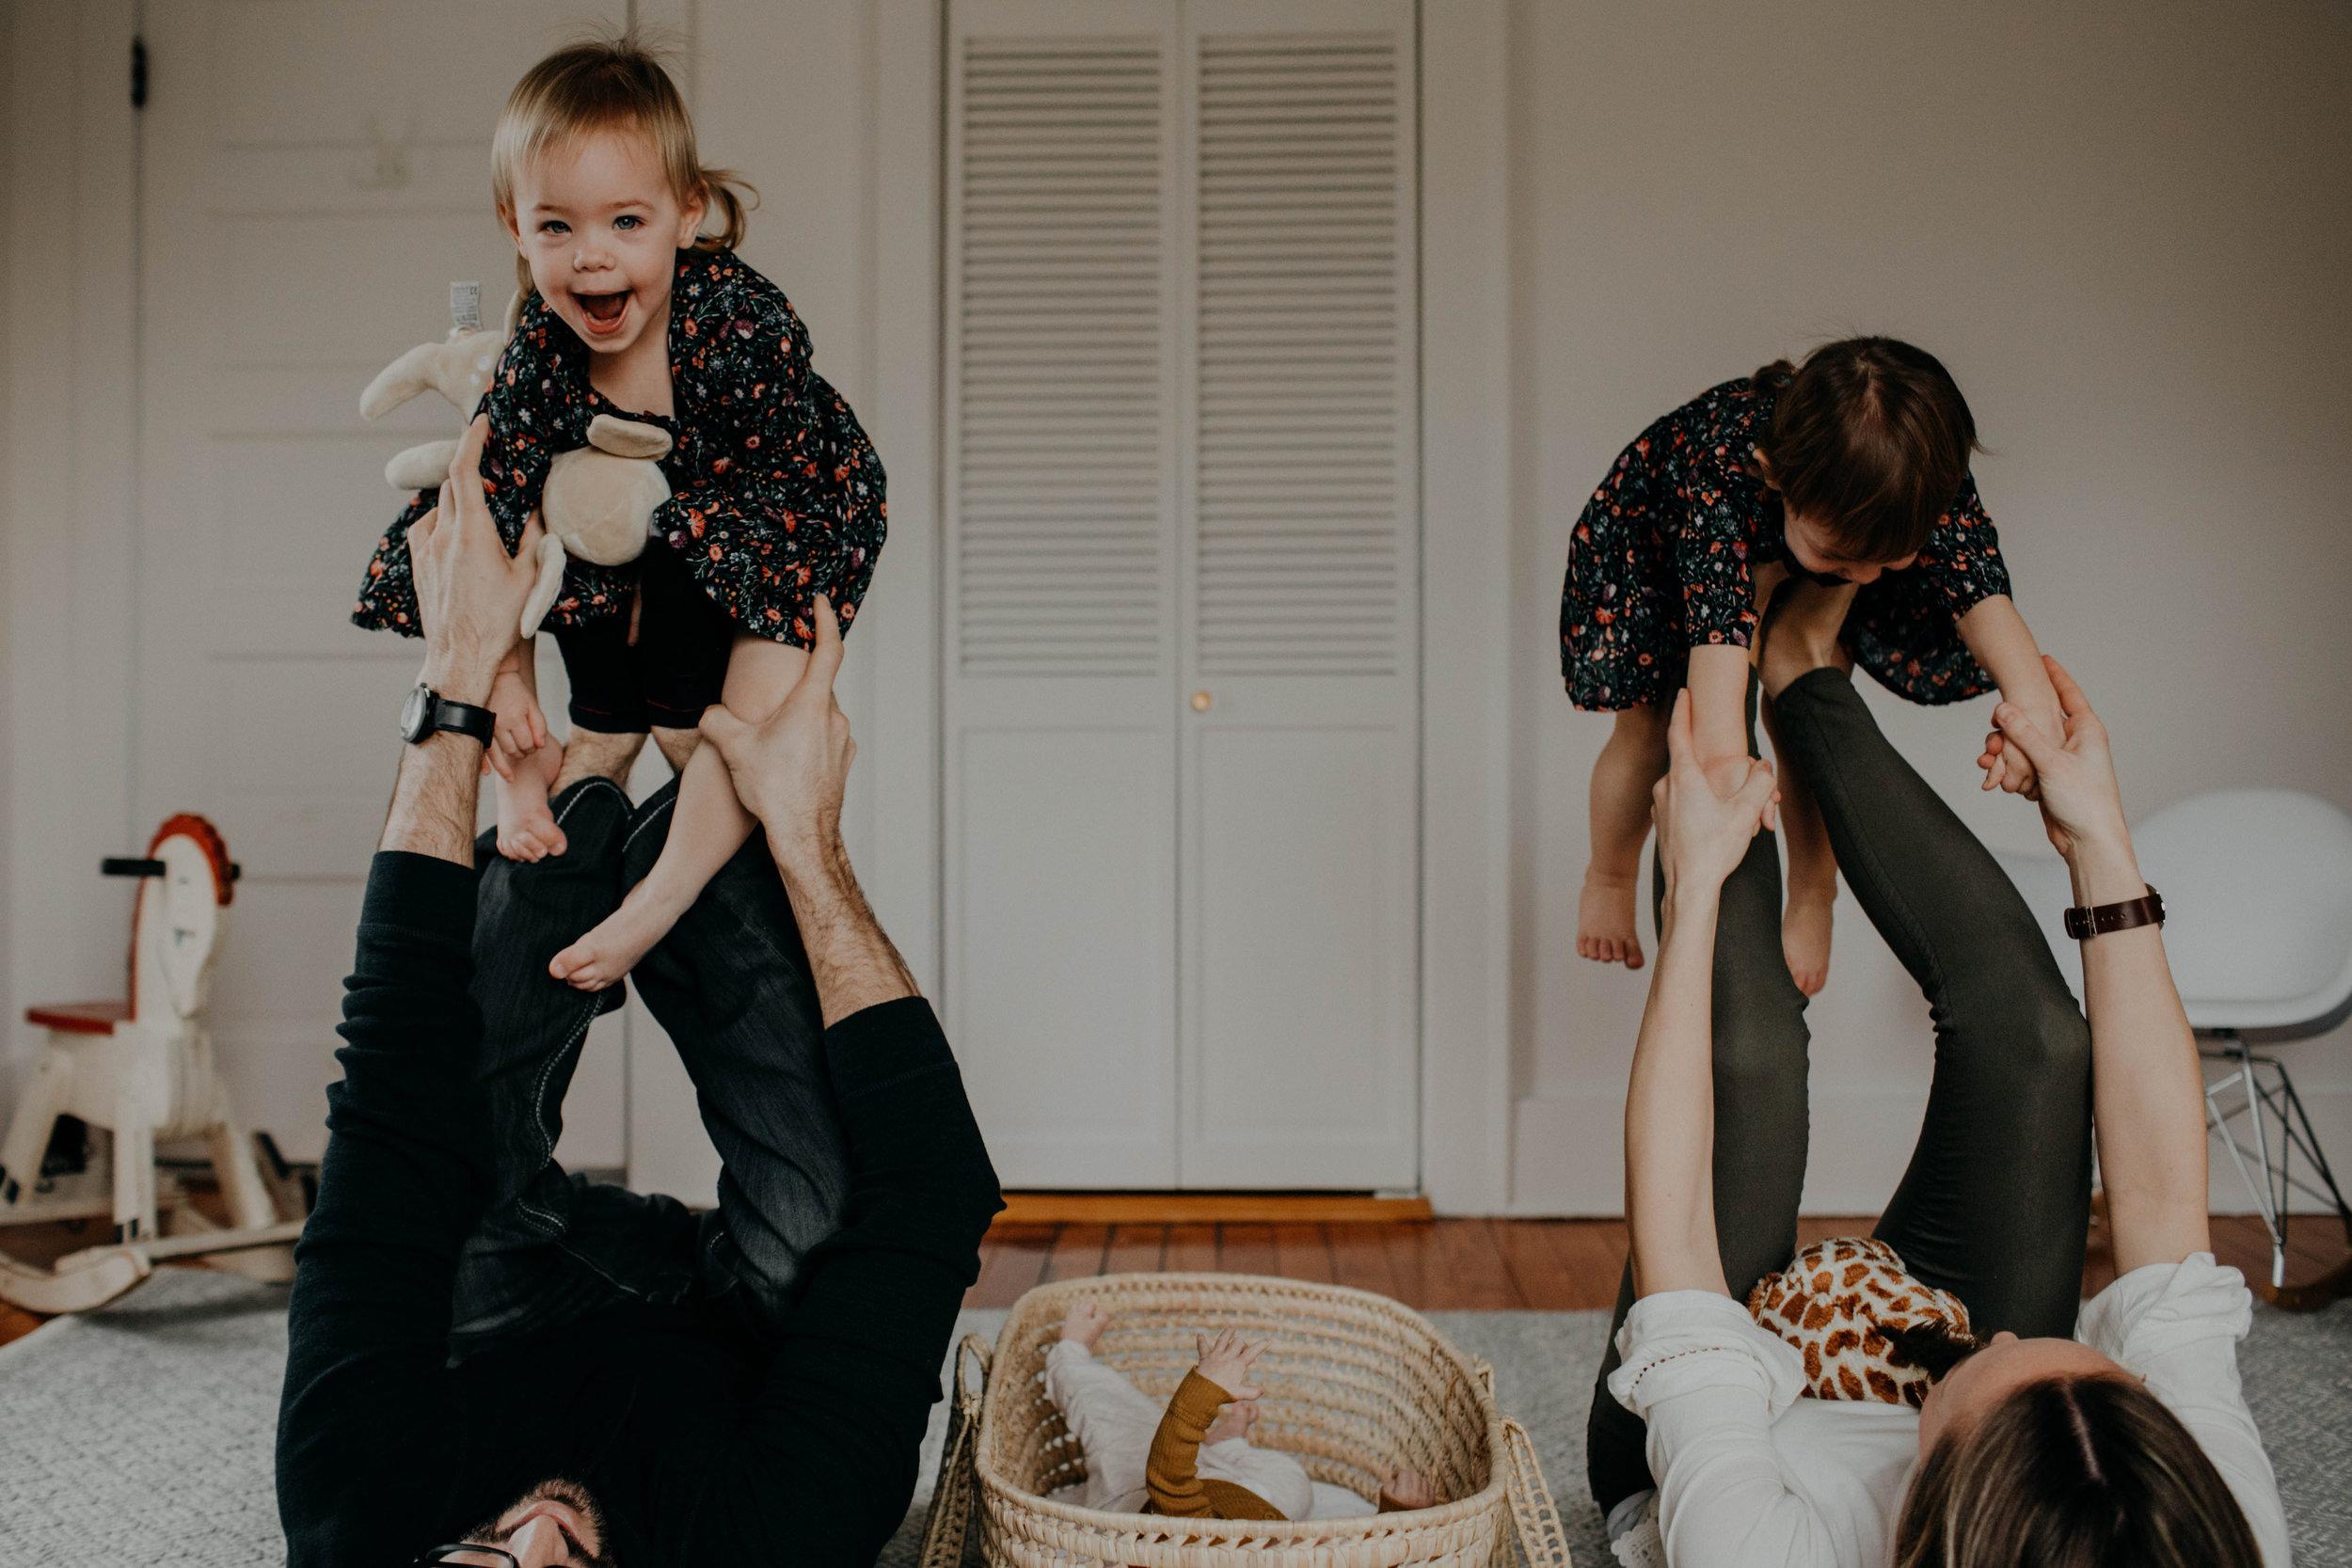 columbus ohio lifestyle family photographer grace e jones photography62.jpg